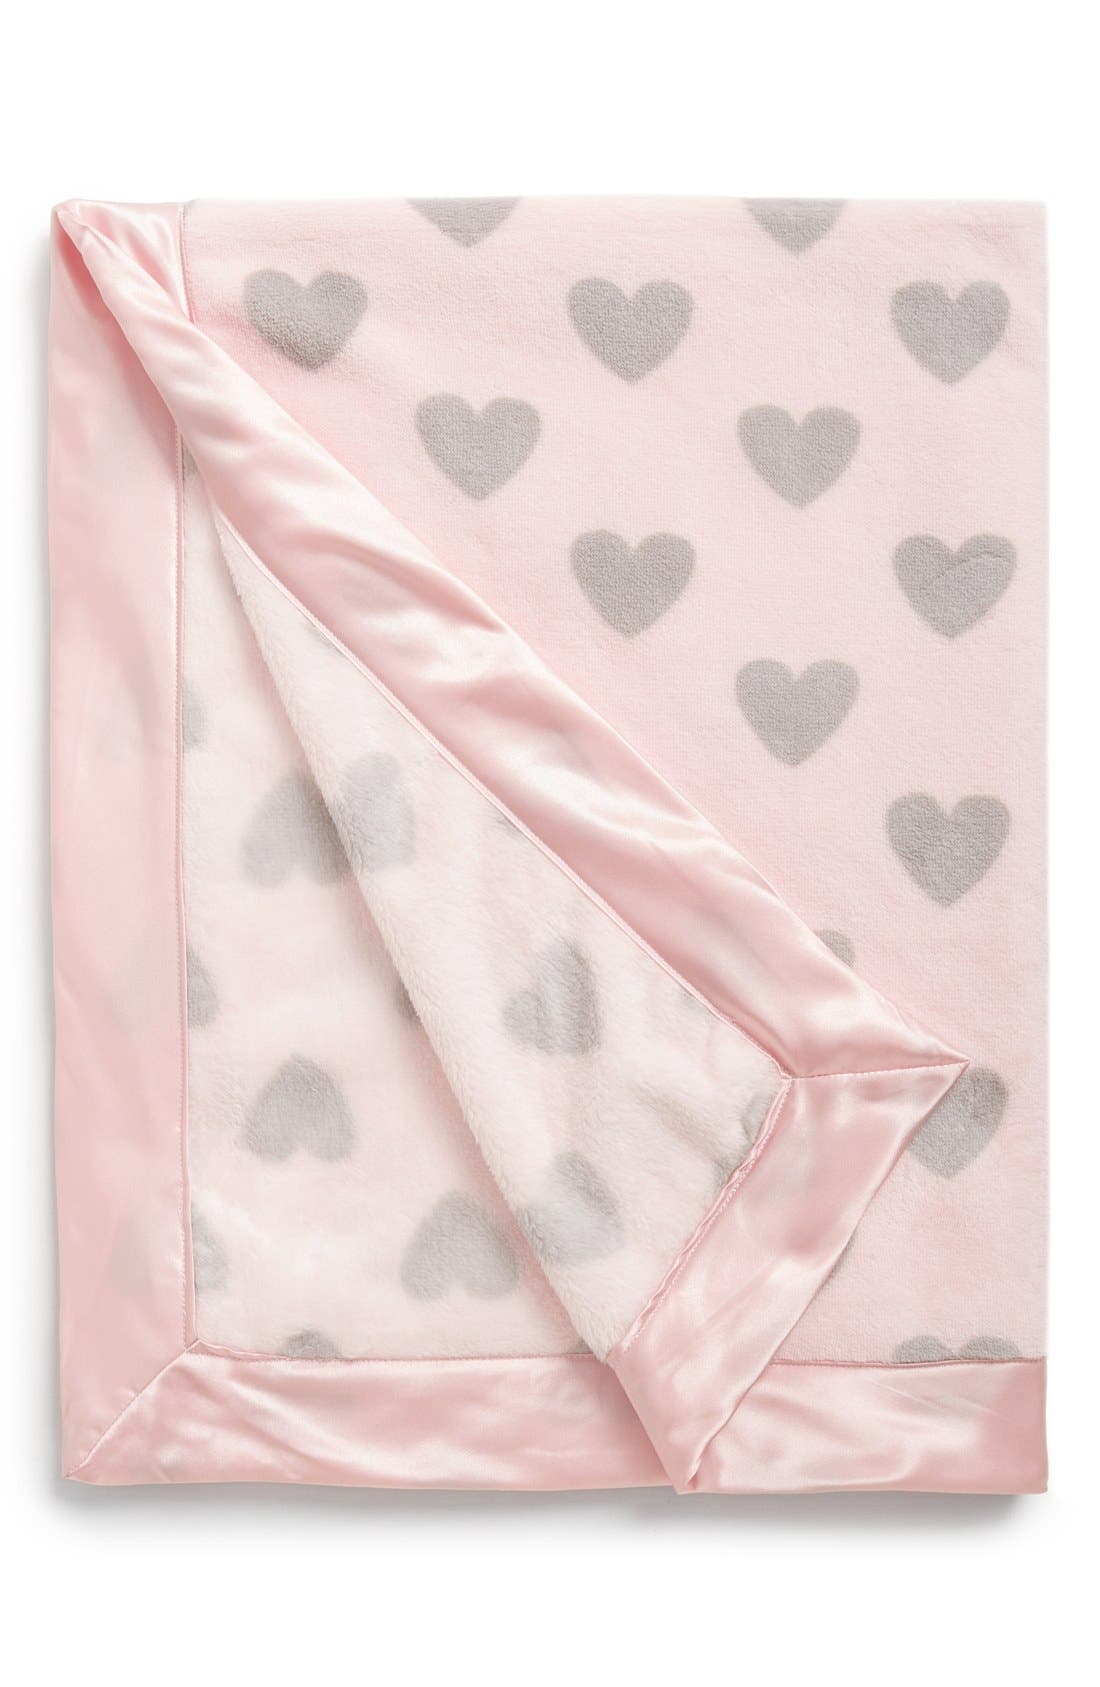 Alternate Image 1 Selected - Nordstrom Baby Print Blanket